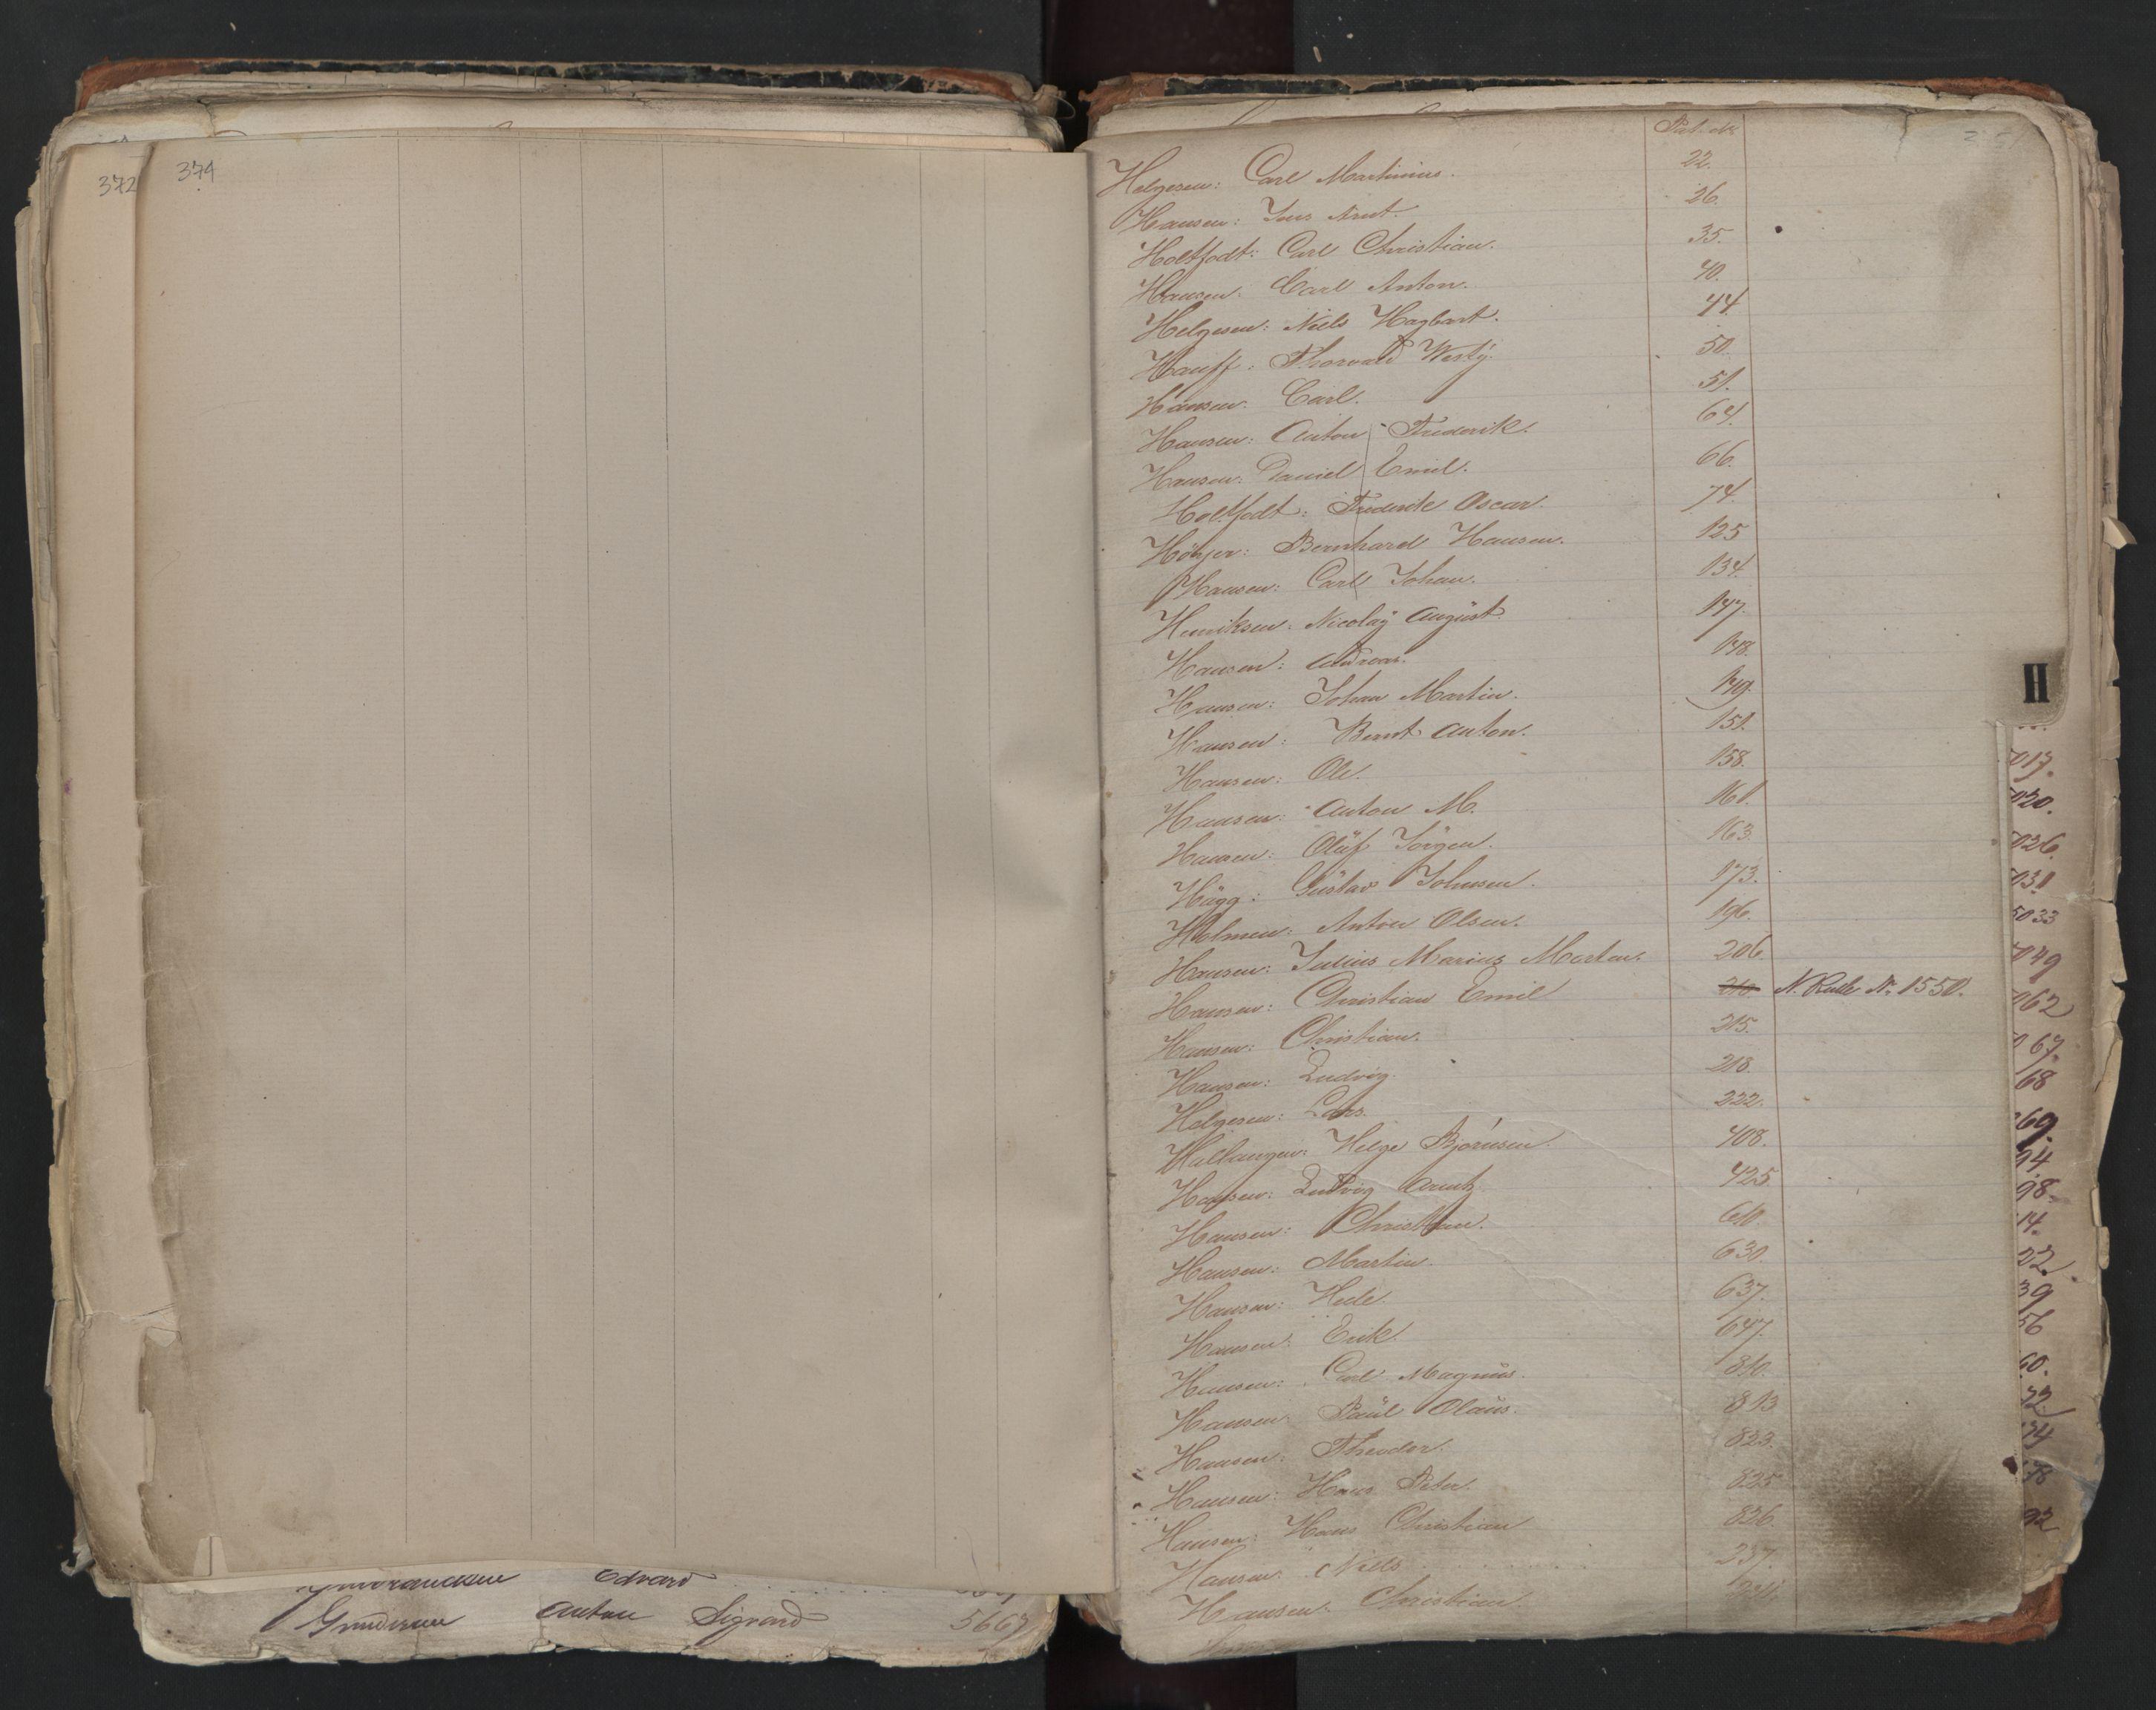 SAO, Oslo sjømannskontor, F/Fa/L0001: Register for Kristiania krets, 1866-1891, s. 374-375